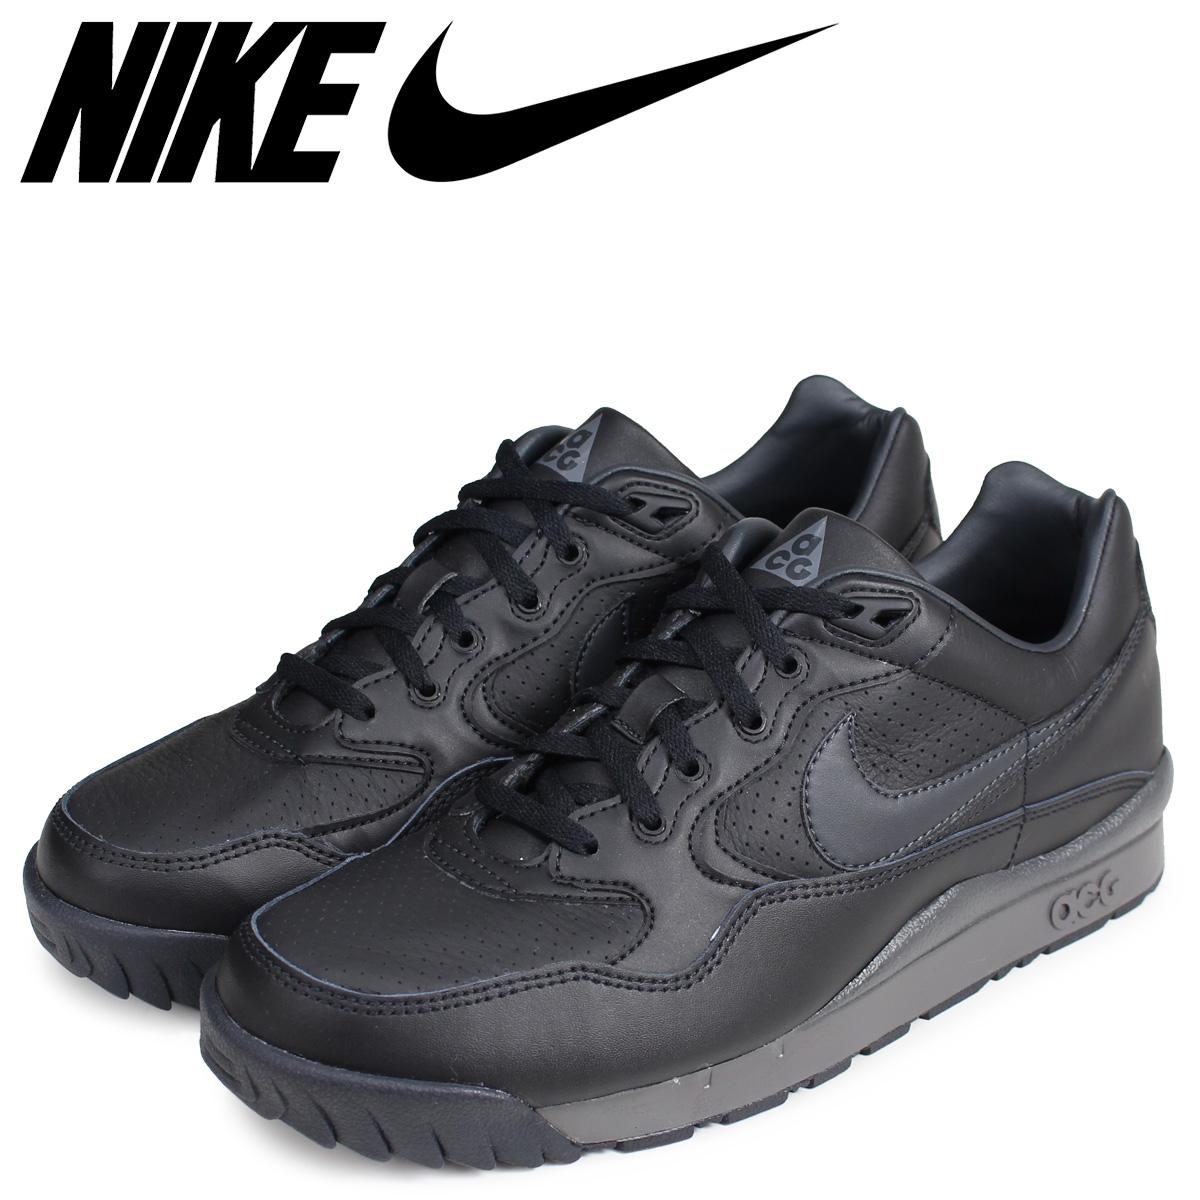 Nike Air Wildwood ACG Anthracite | AO3116 003 | AFEW STORE